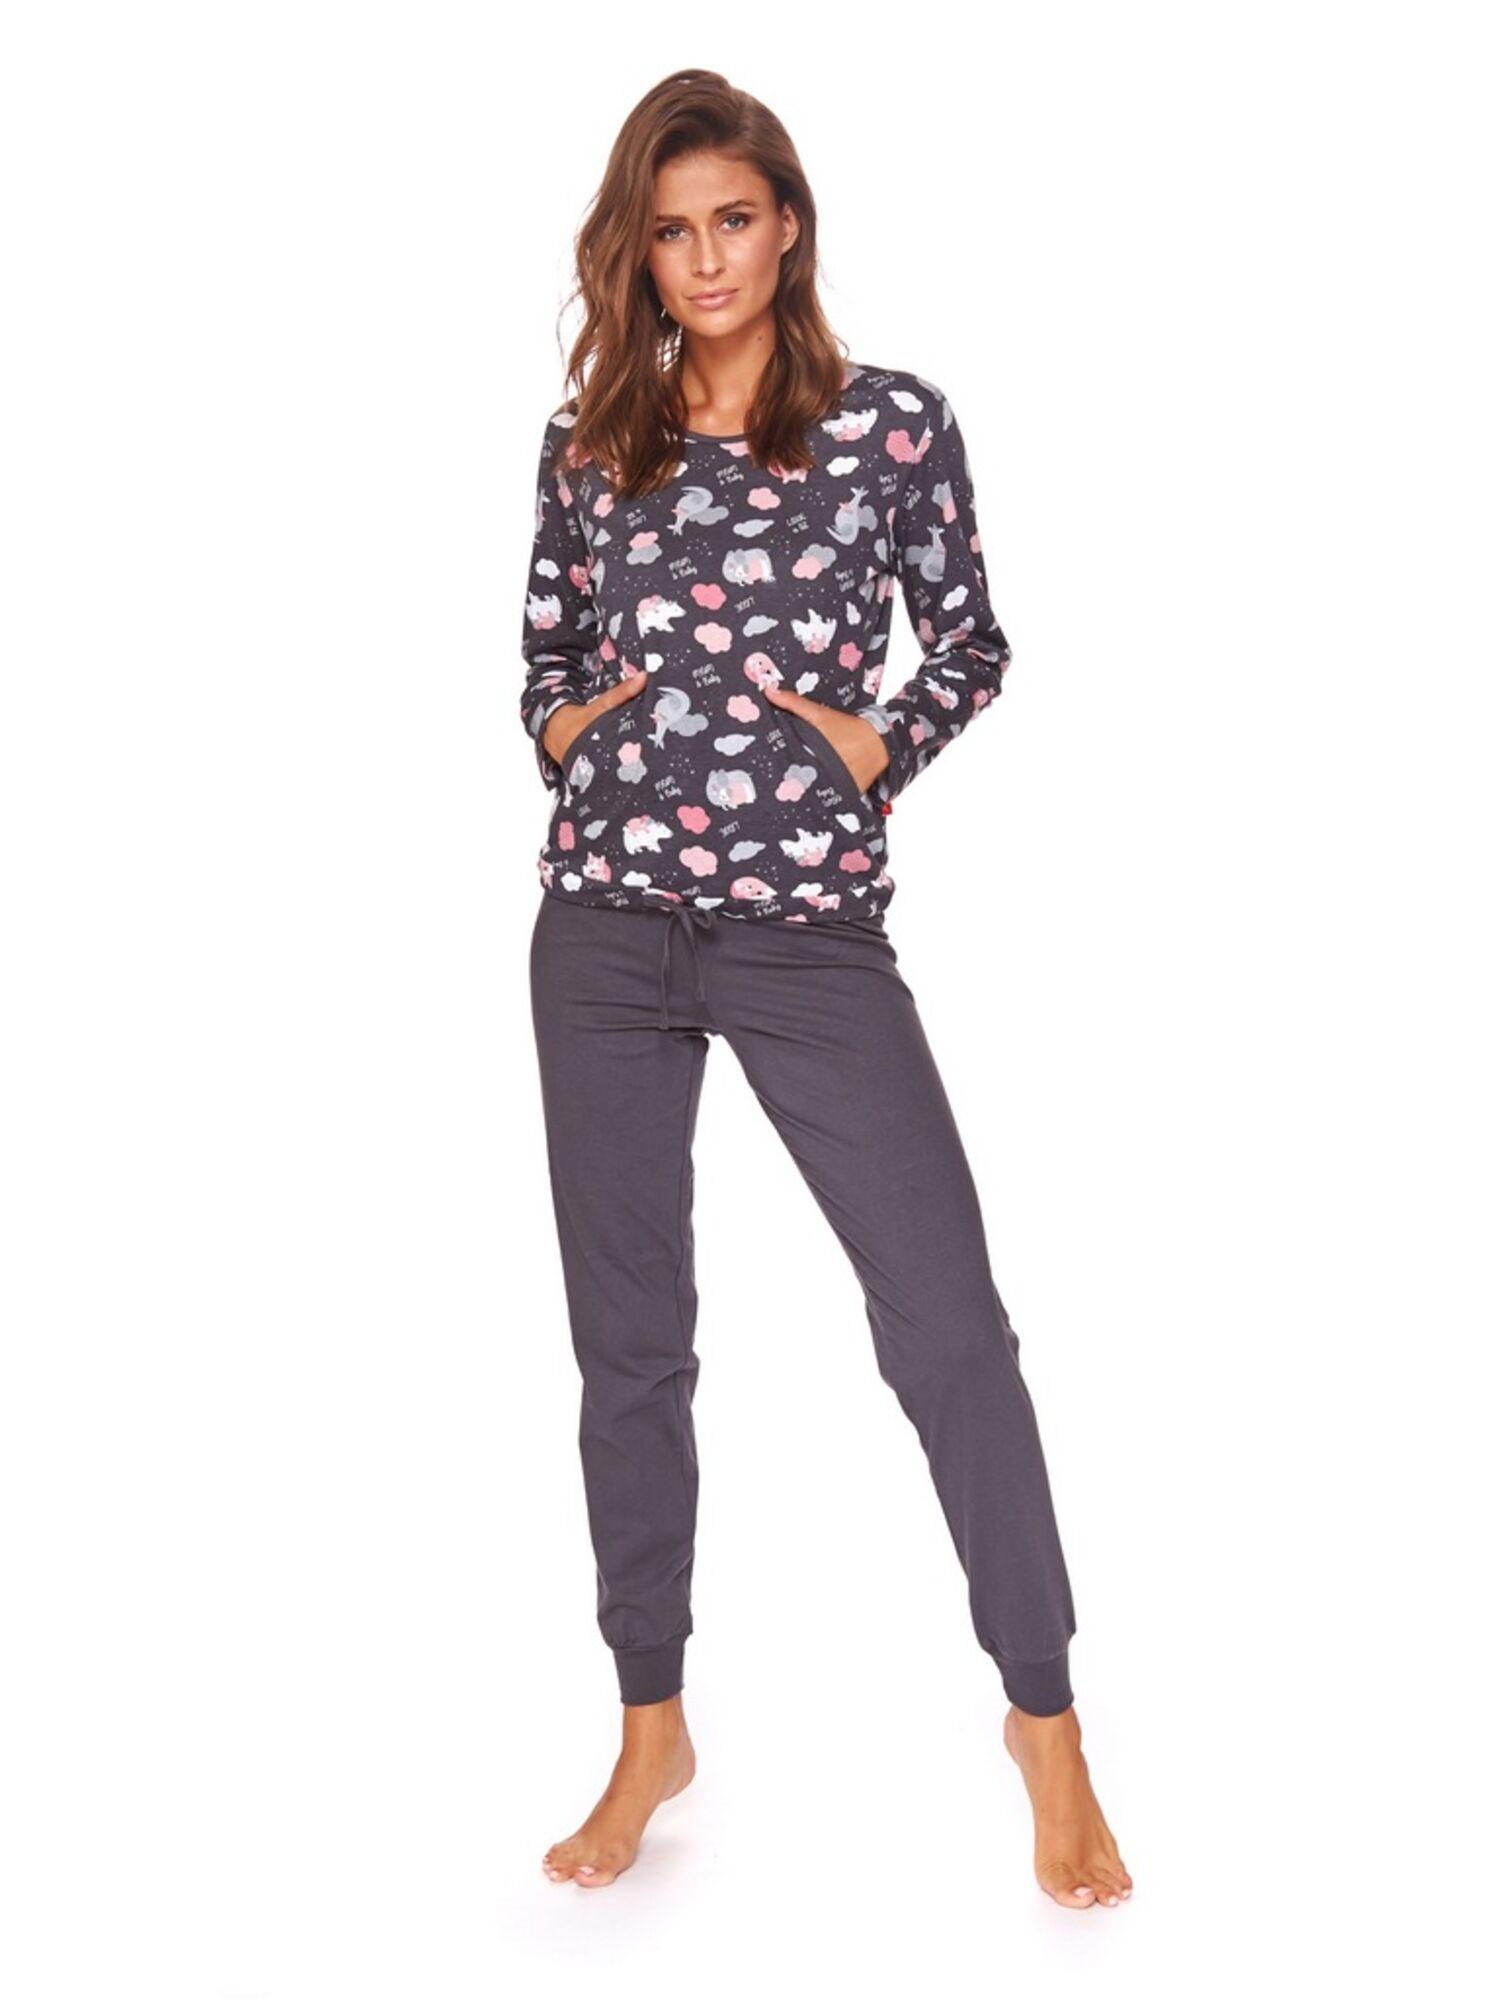 Пижама женская со штанами 4118 PM, серый, DOCTOR NAP